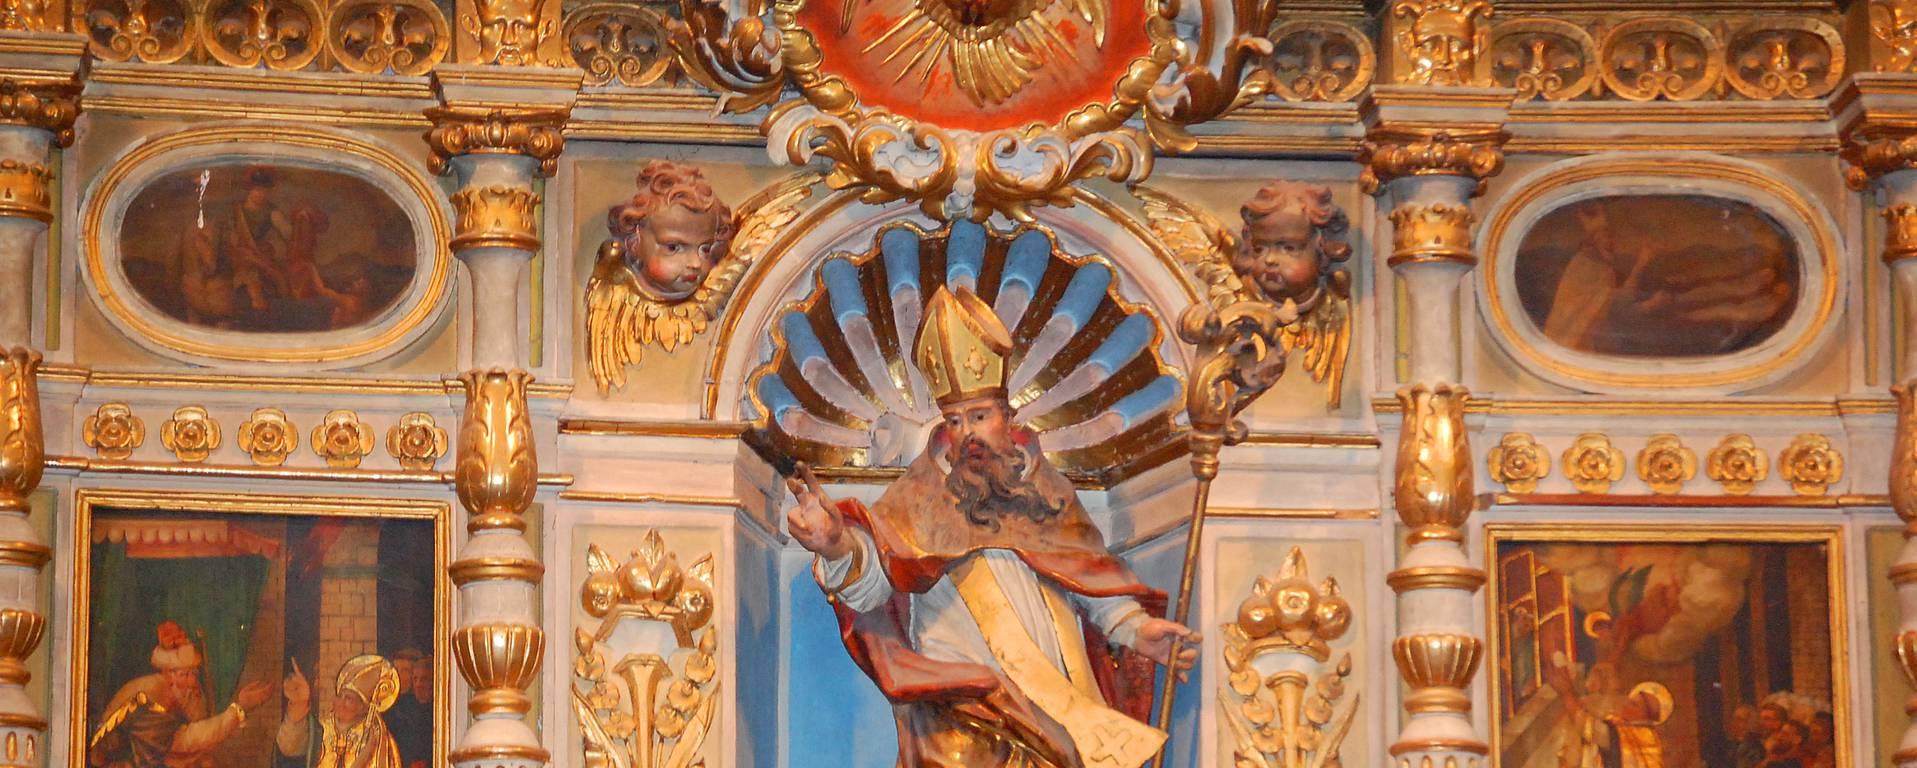 Barok detail